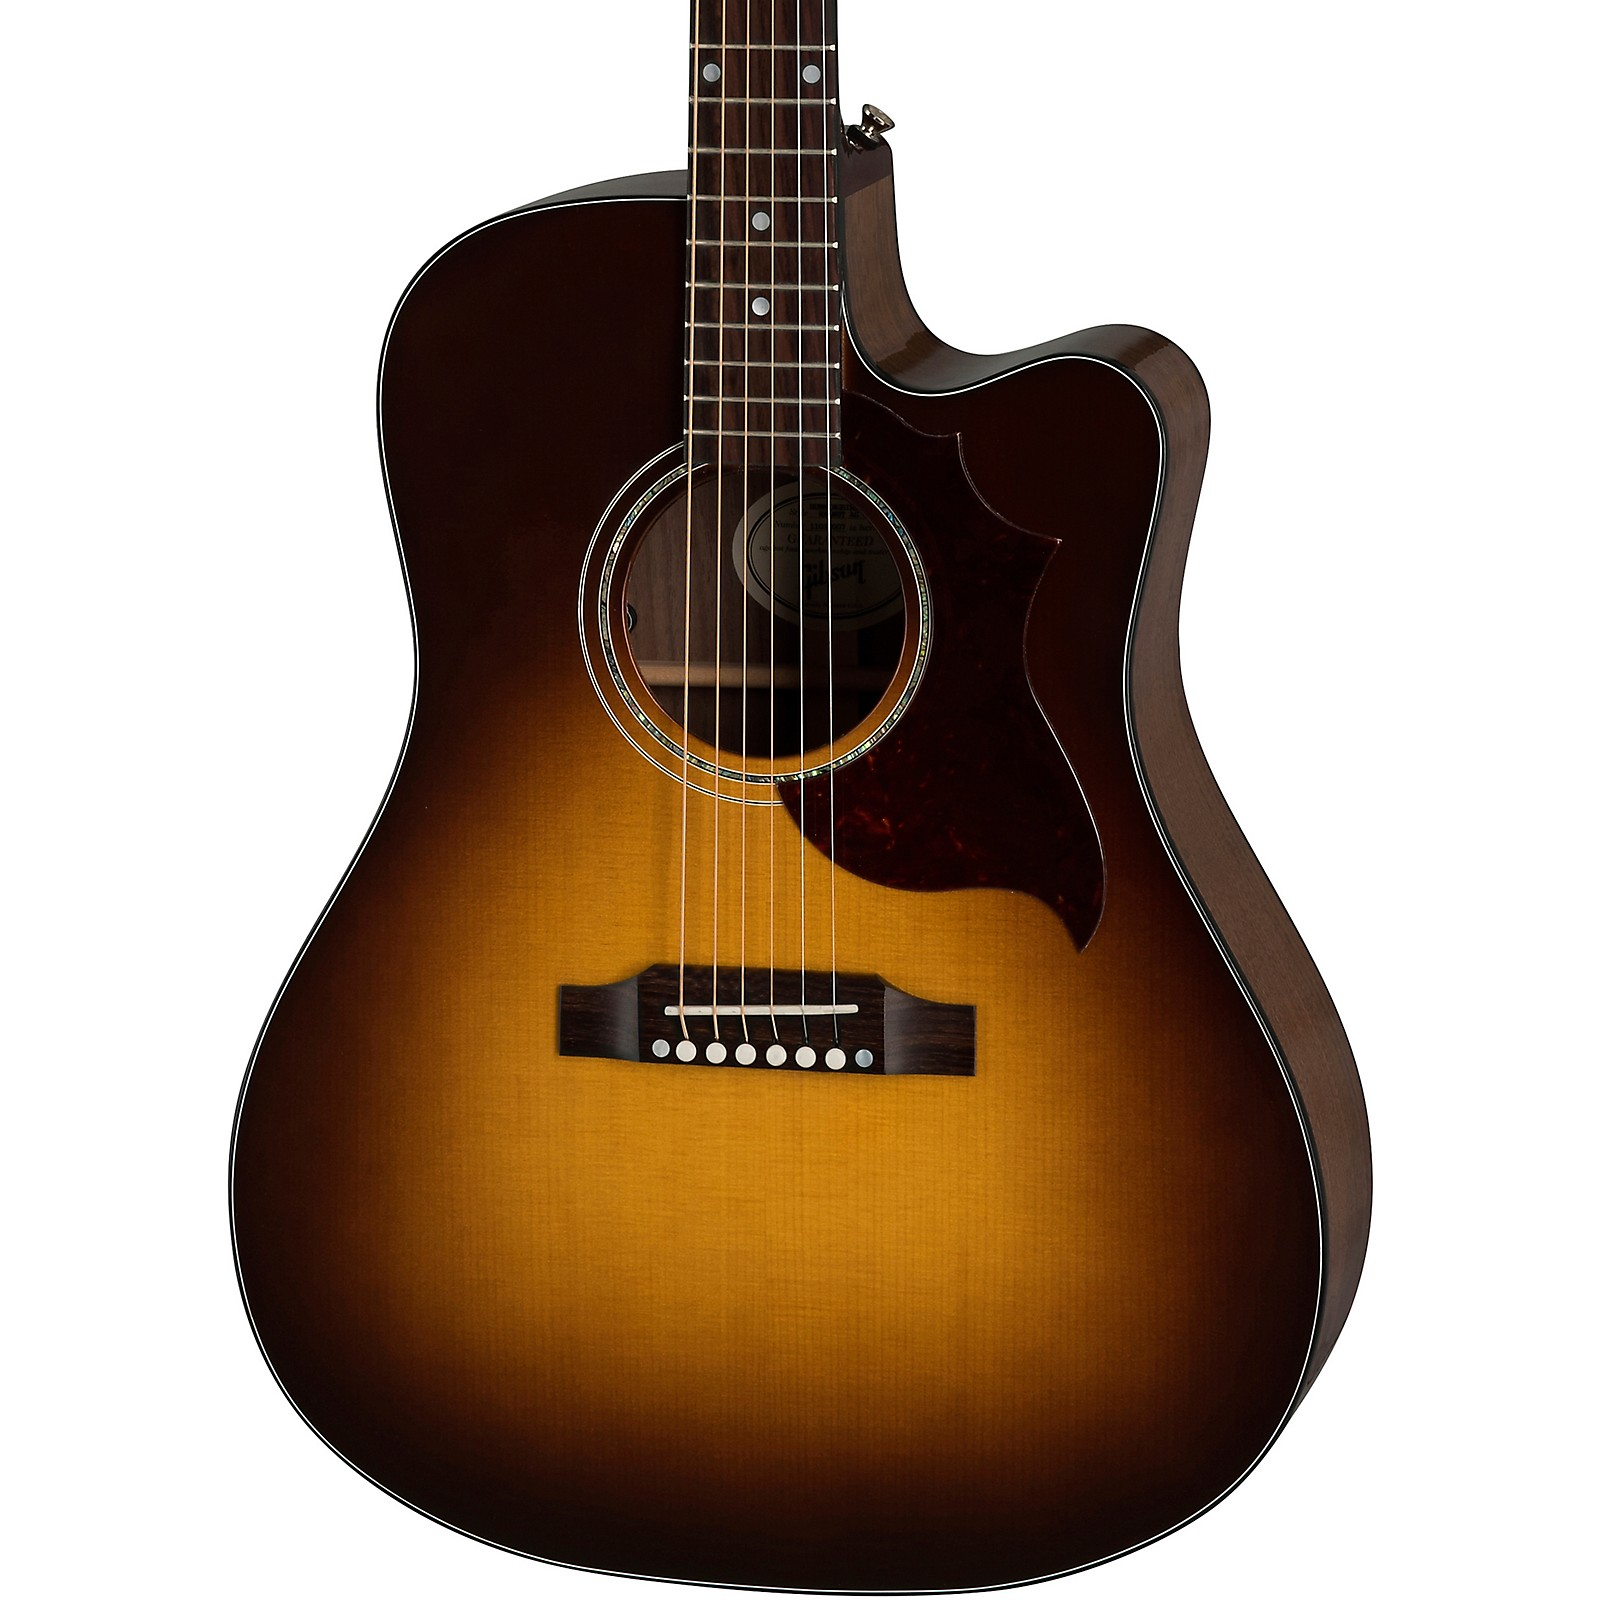 Gibson Songwriter Modern EC Walnut Acoustic-Electric Guitar